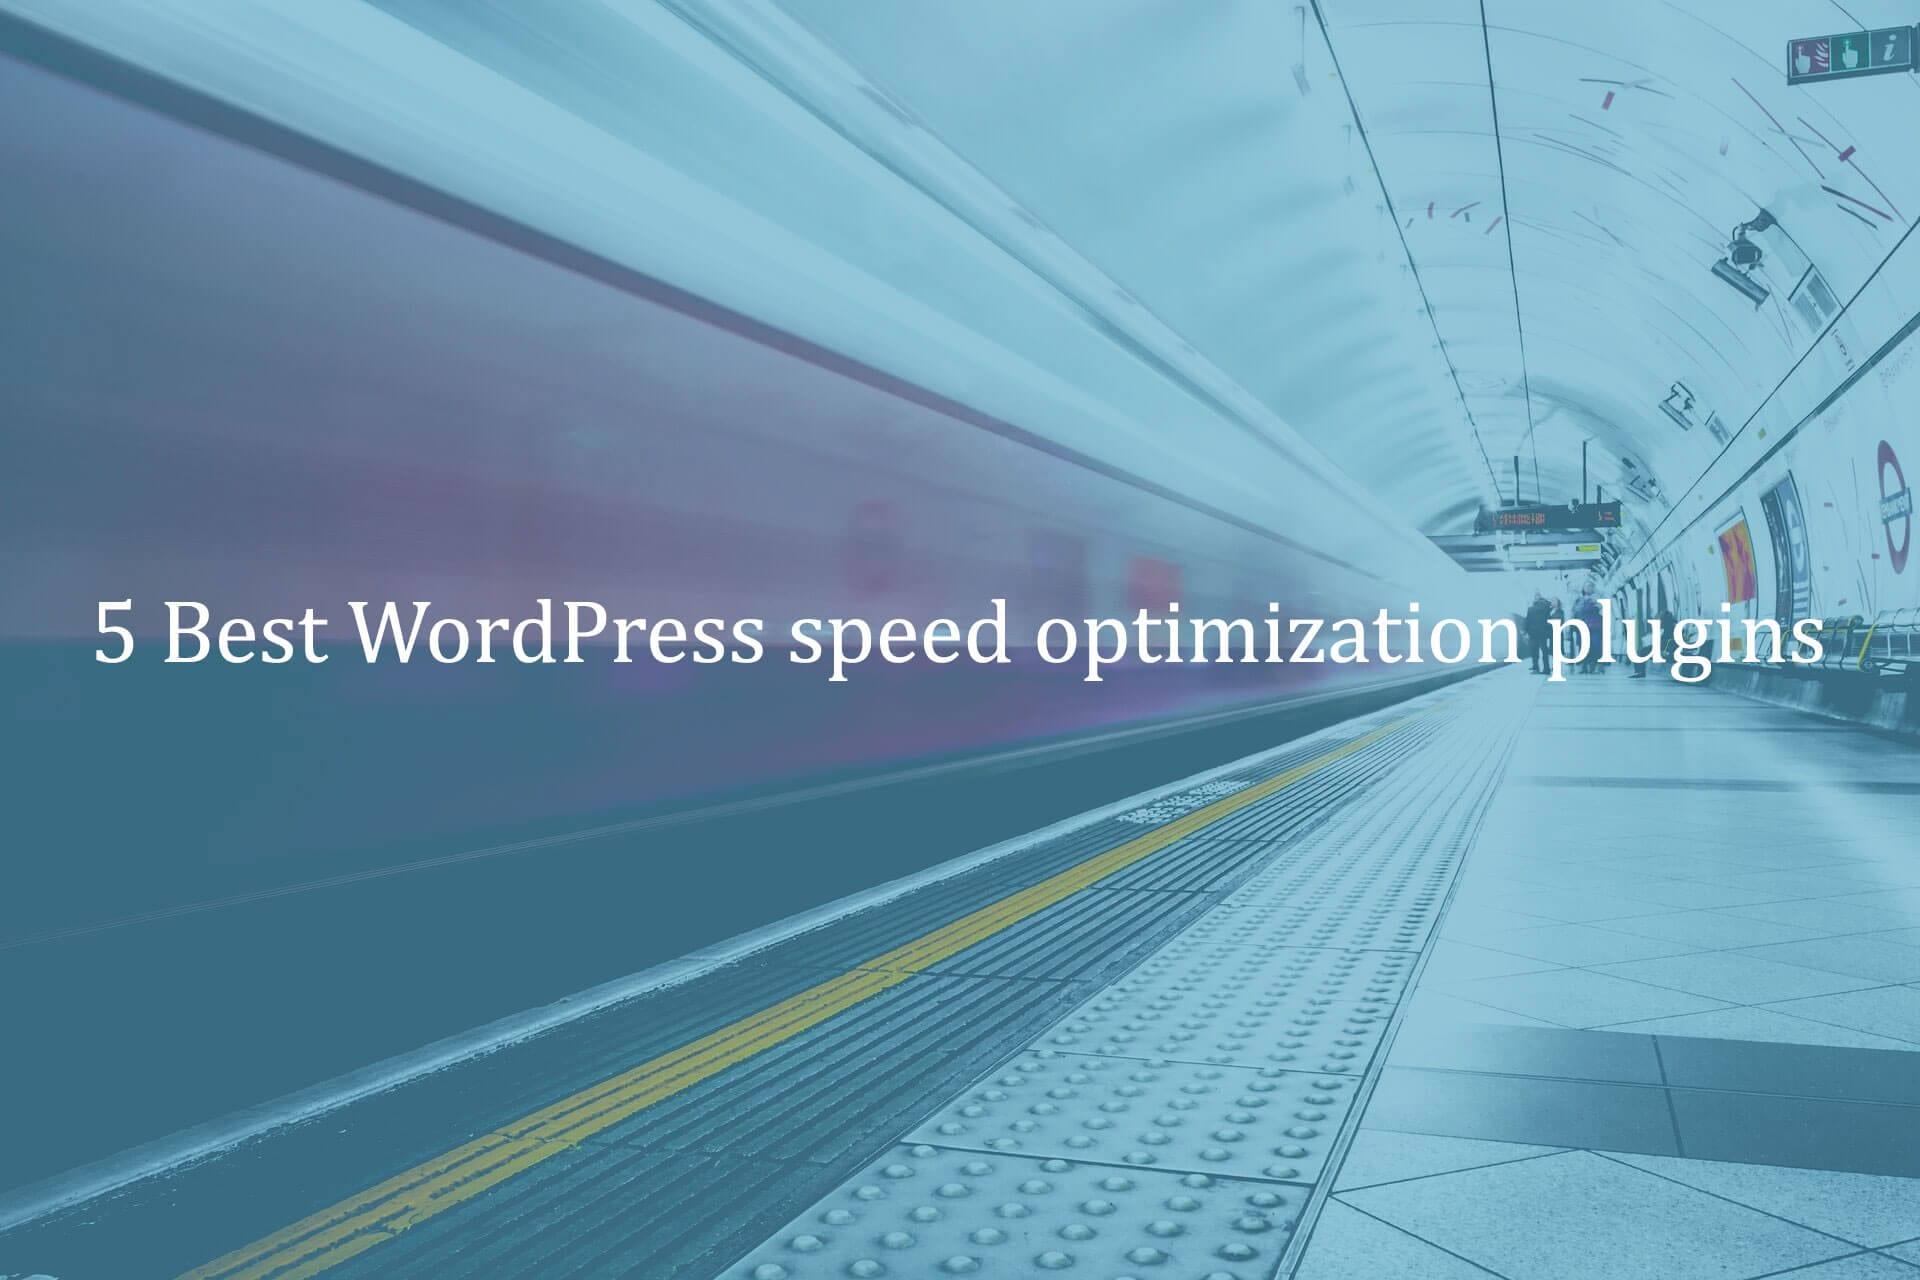 5-Best-WordPress-speed optimization-plugin